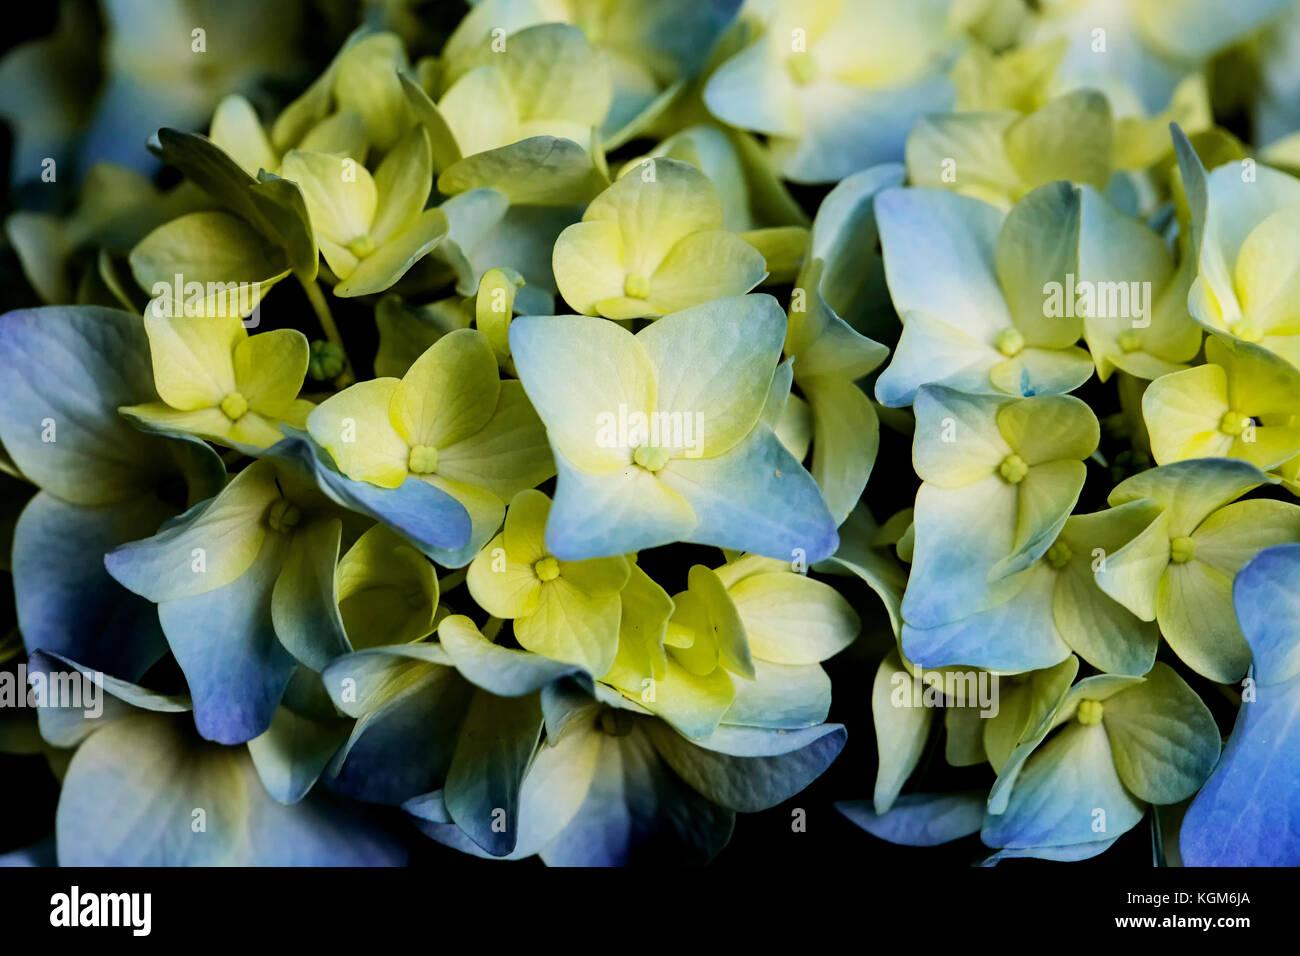 Closeup of blue and yellow hydrangea bush flowers stock photo closeup of blue and yellow hydrangea bush flowers mightylinksfo